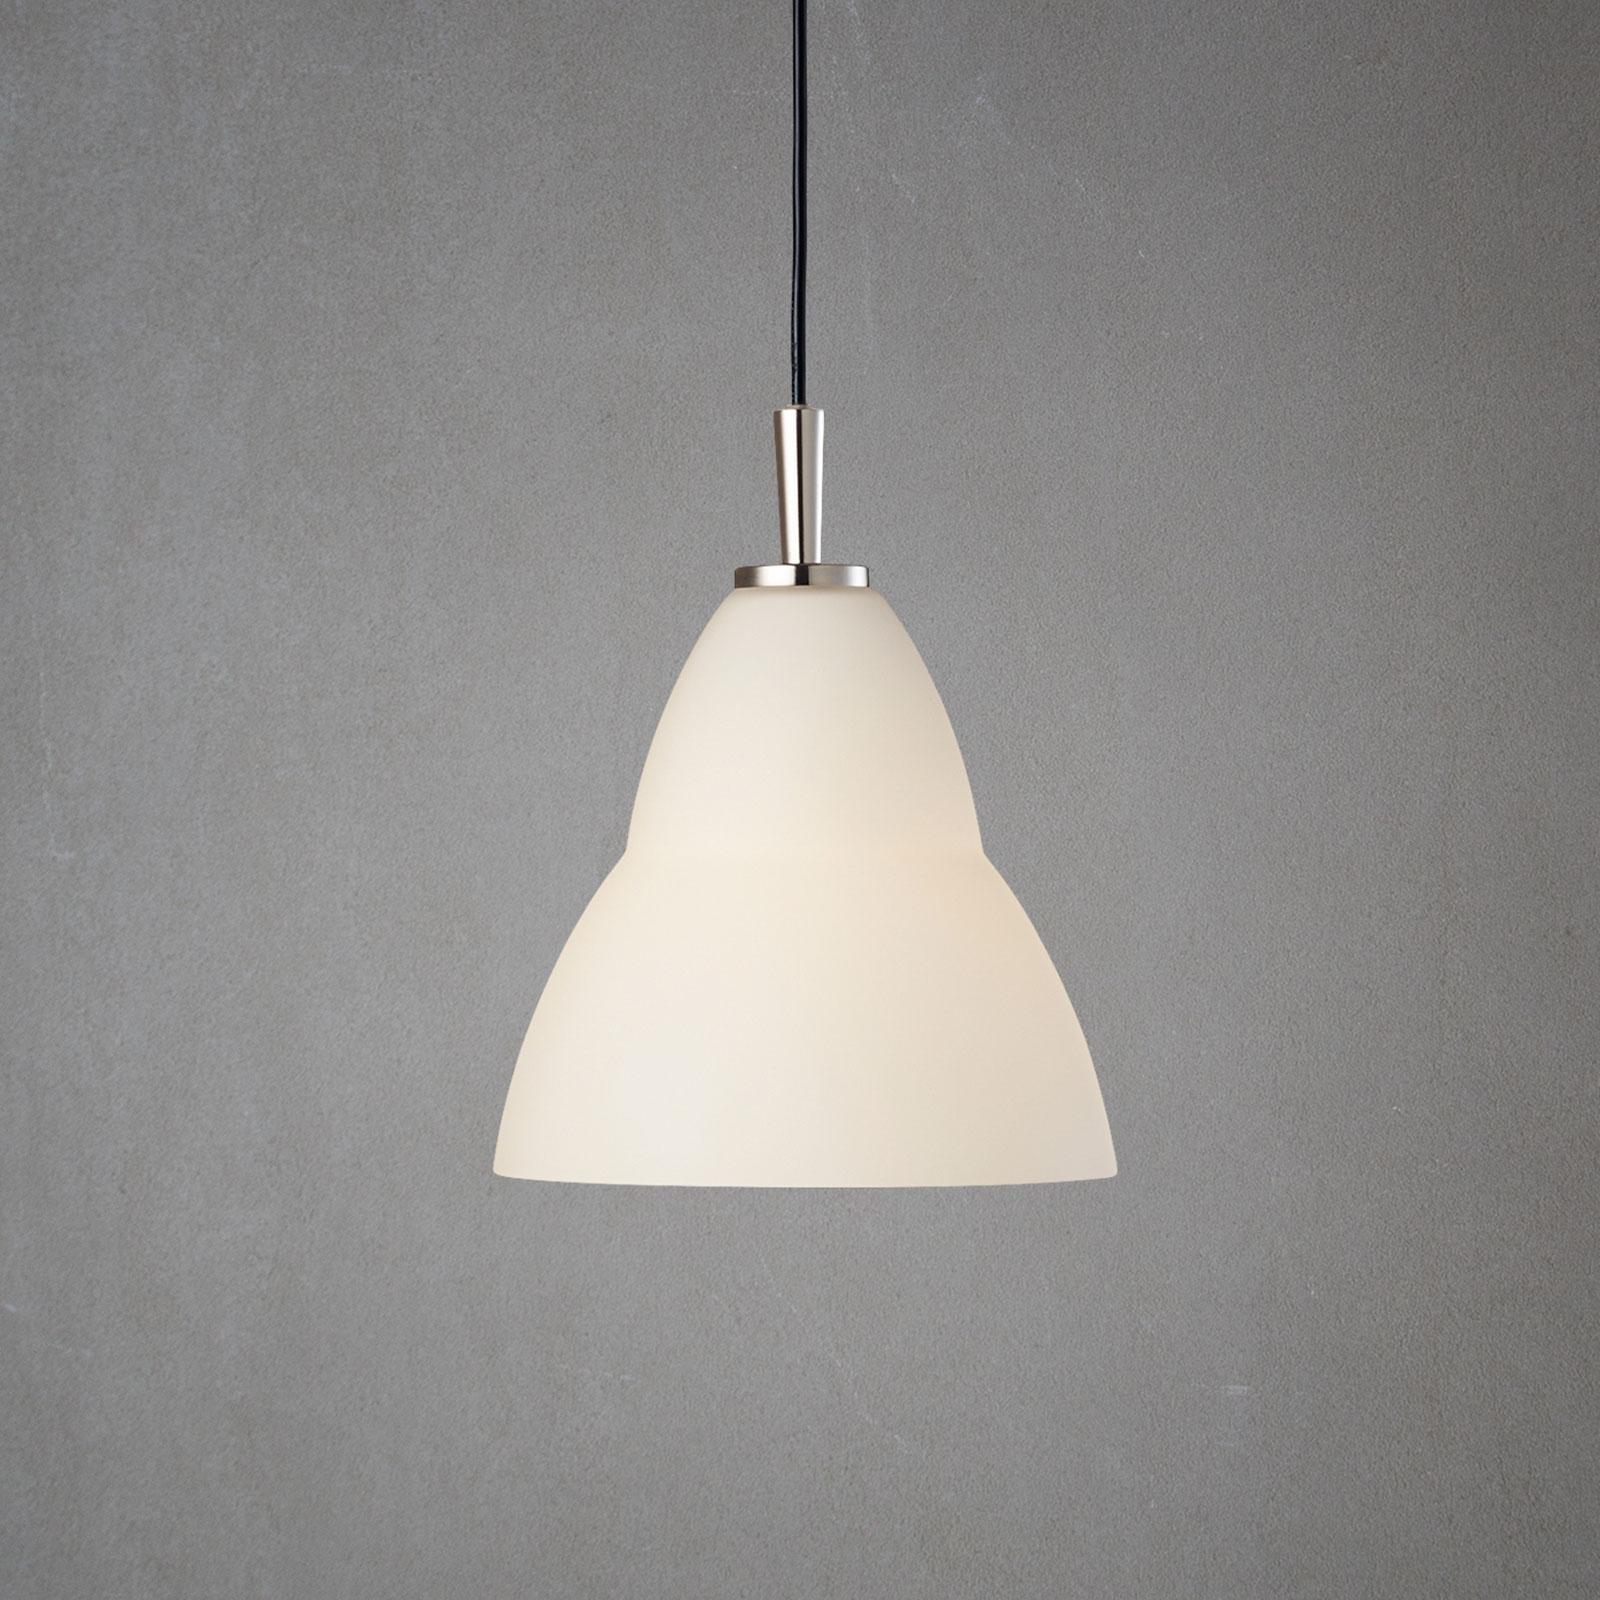 Glas-hanglamp Fico S, Ø 18 cm